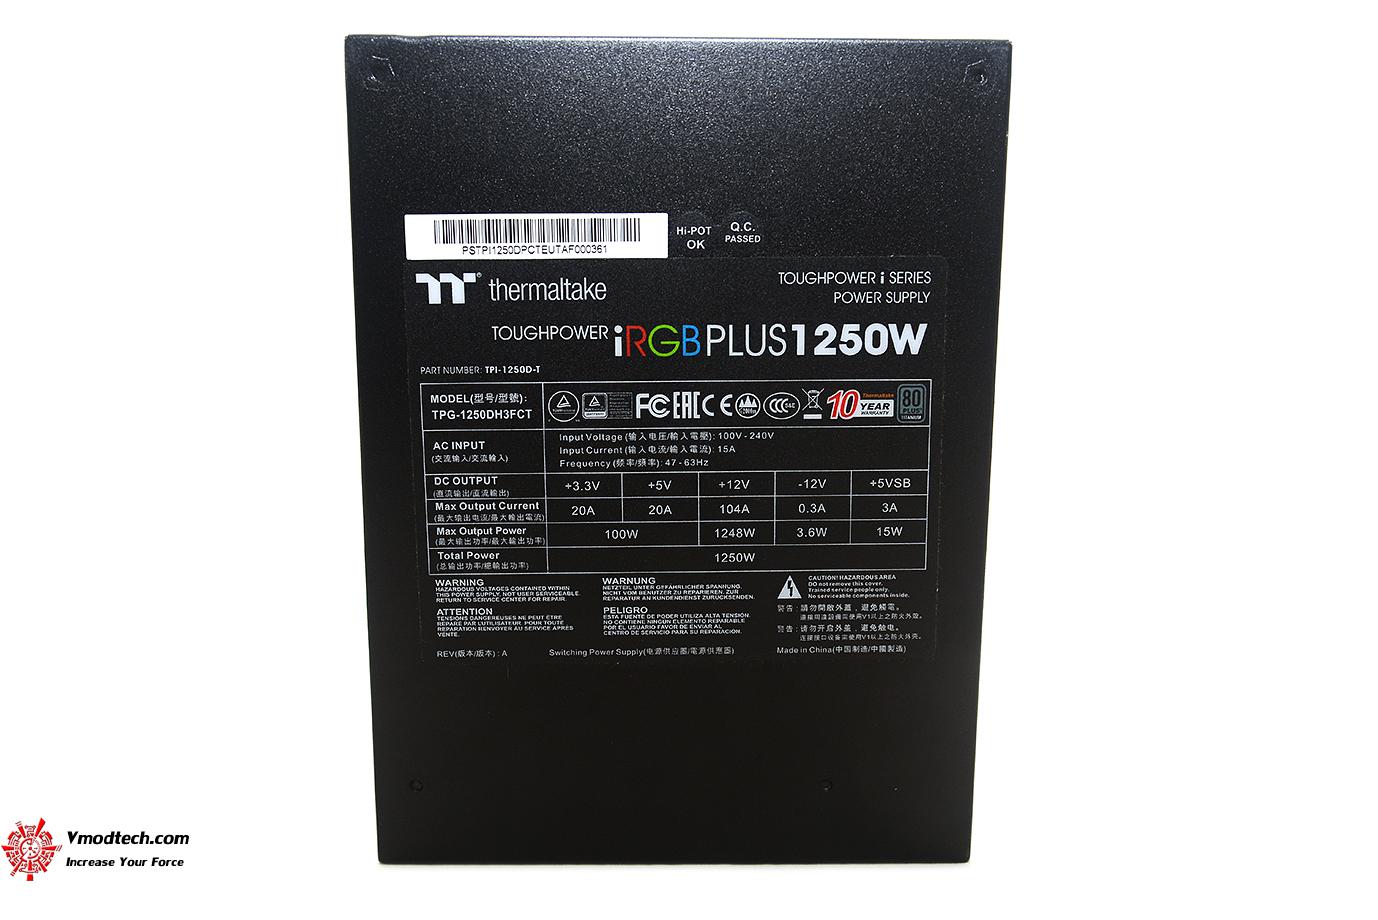 dsc 2553 Thermaltake Toughpower iRGB PLUS 1250W Titanium   TT Premium Edition Review